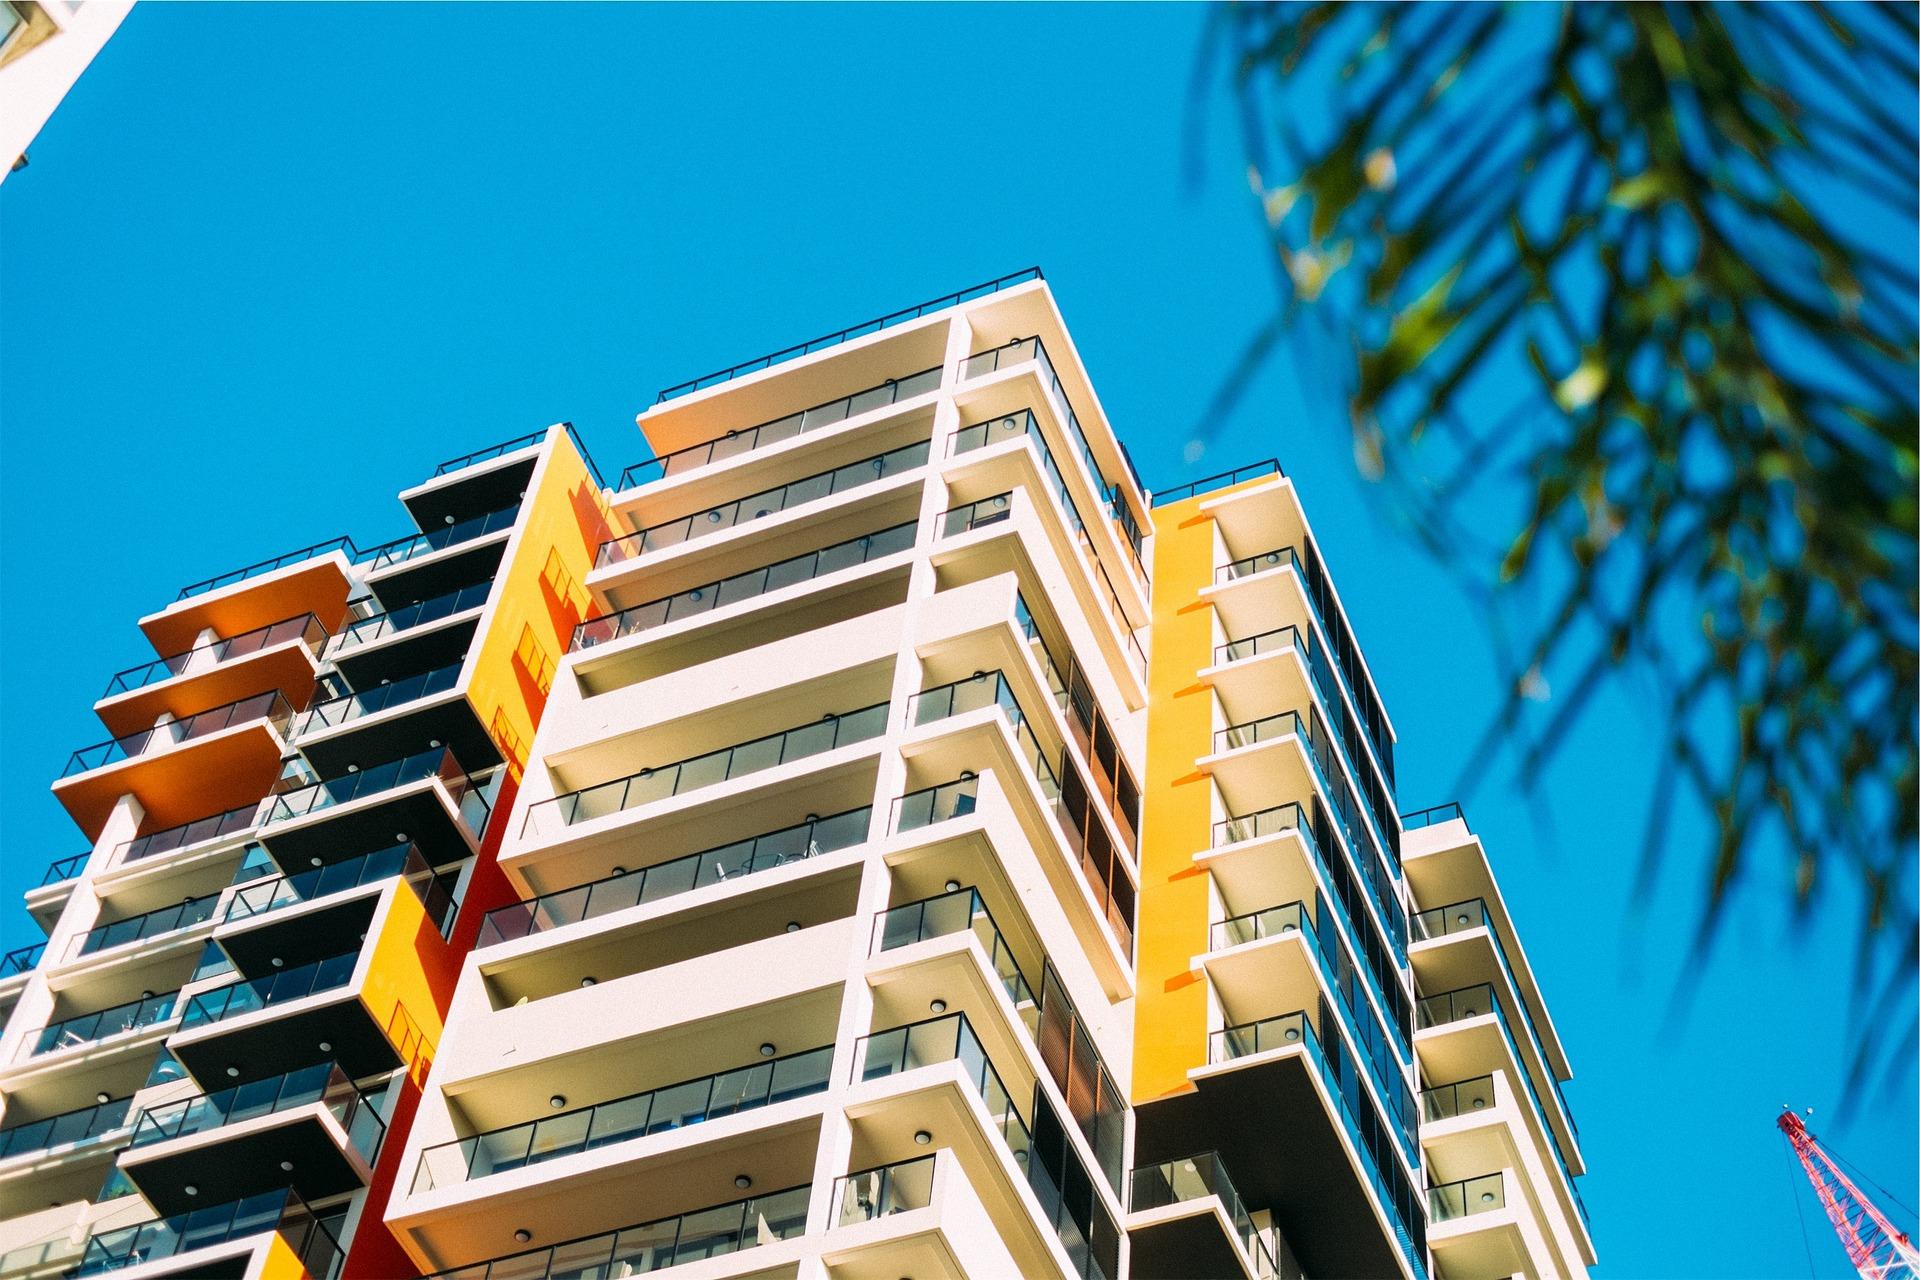 Riscaldamento A Pavimento Consumi riscaldamento a pavimento in condominio con impianto